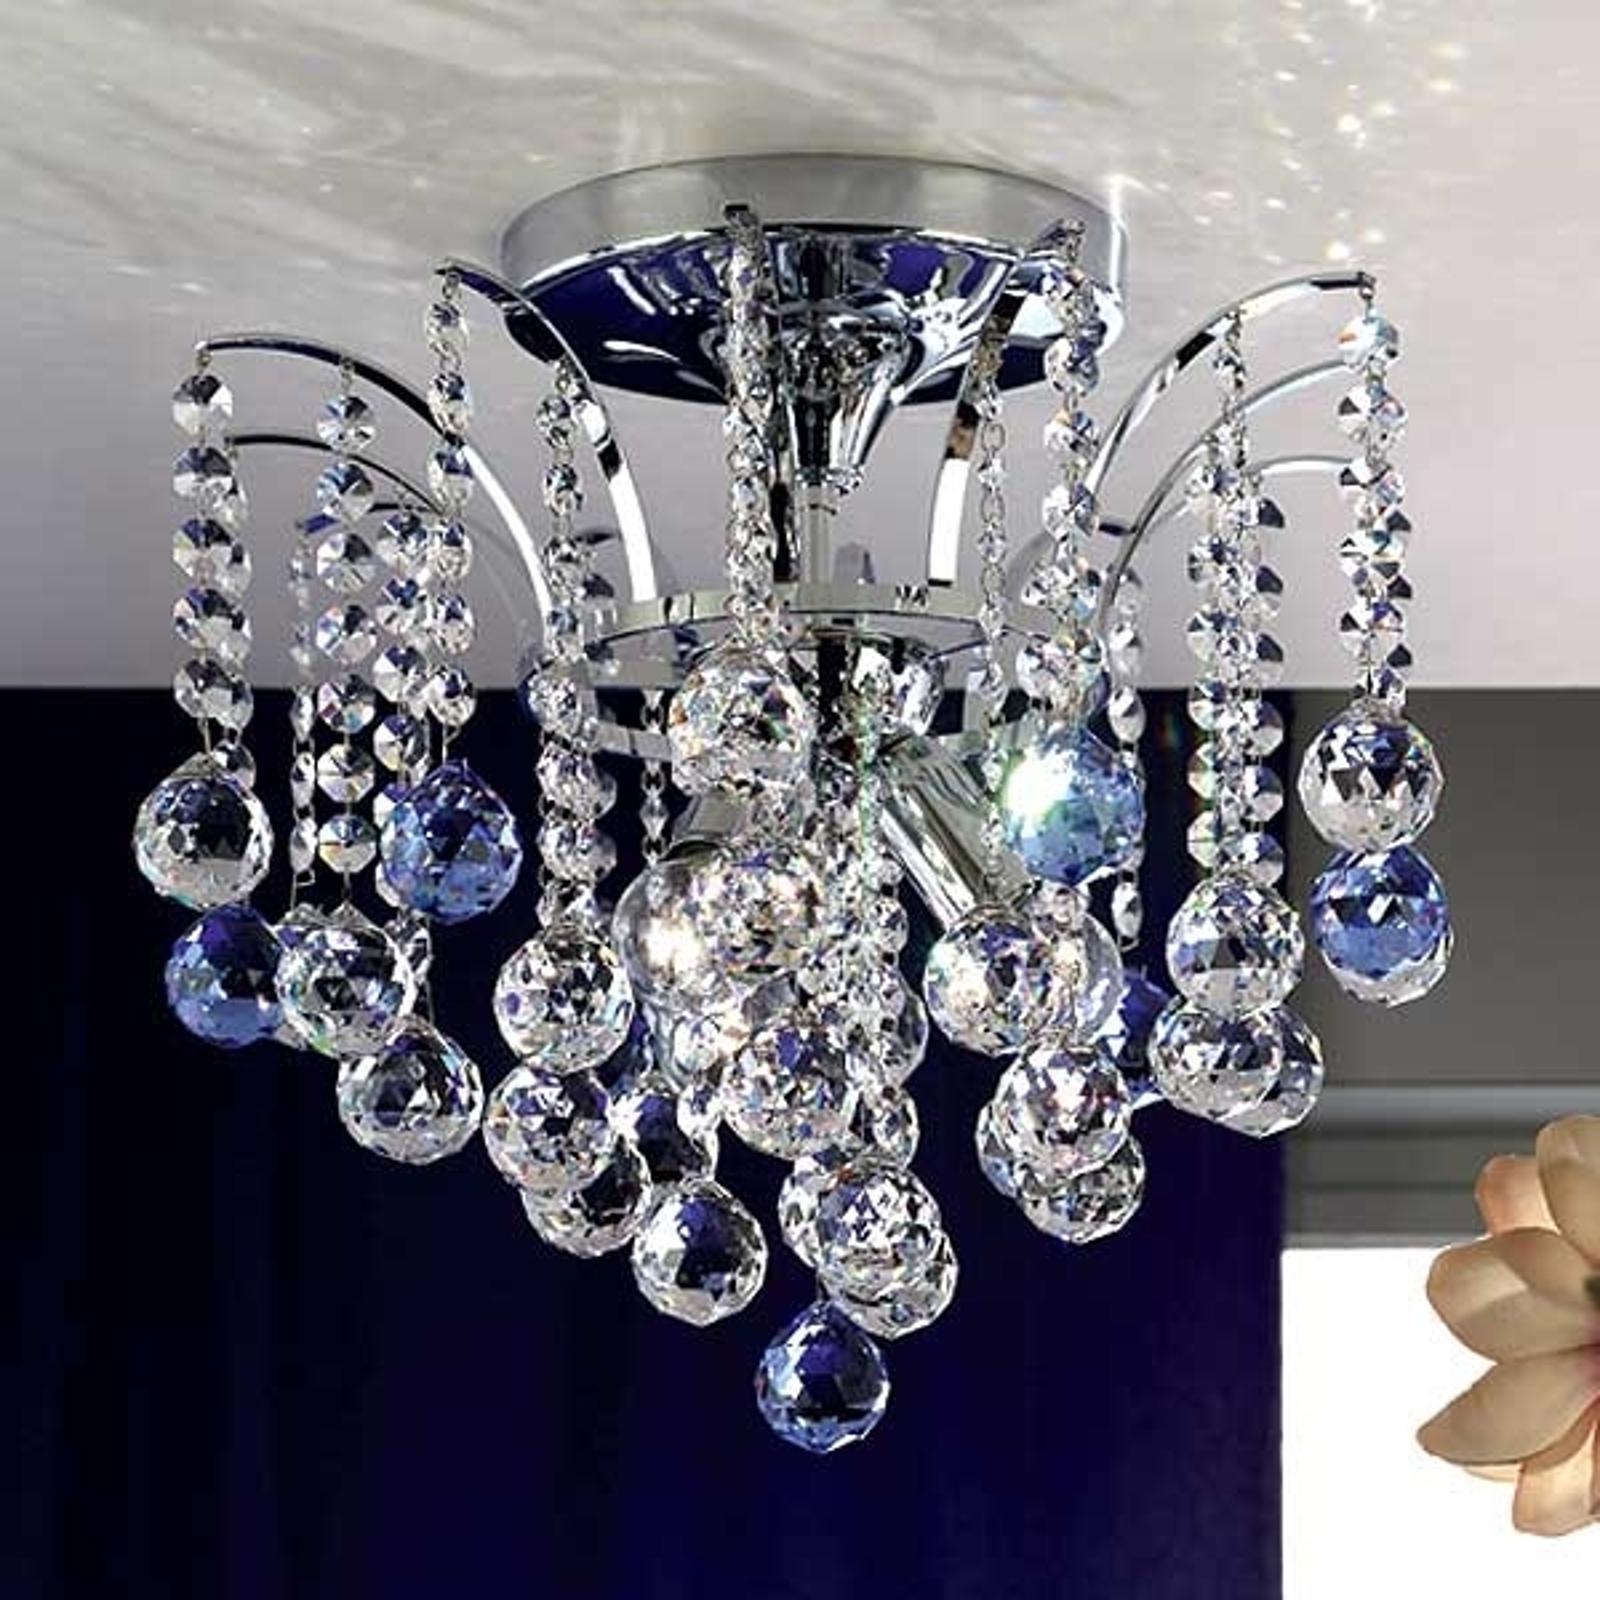 Glitrende LENNARDA krystalloftlampe 42 cm